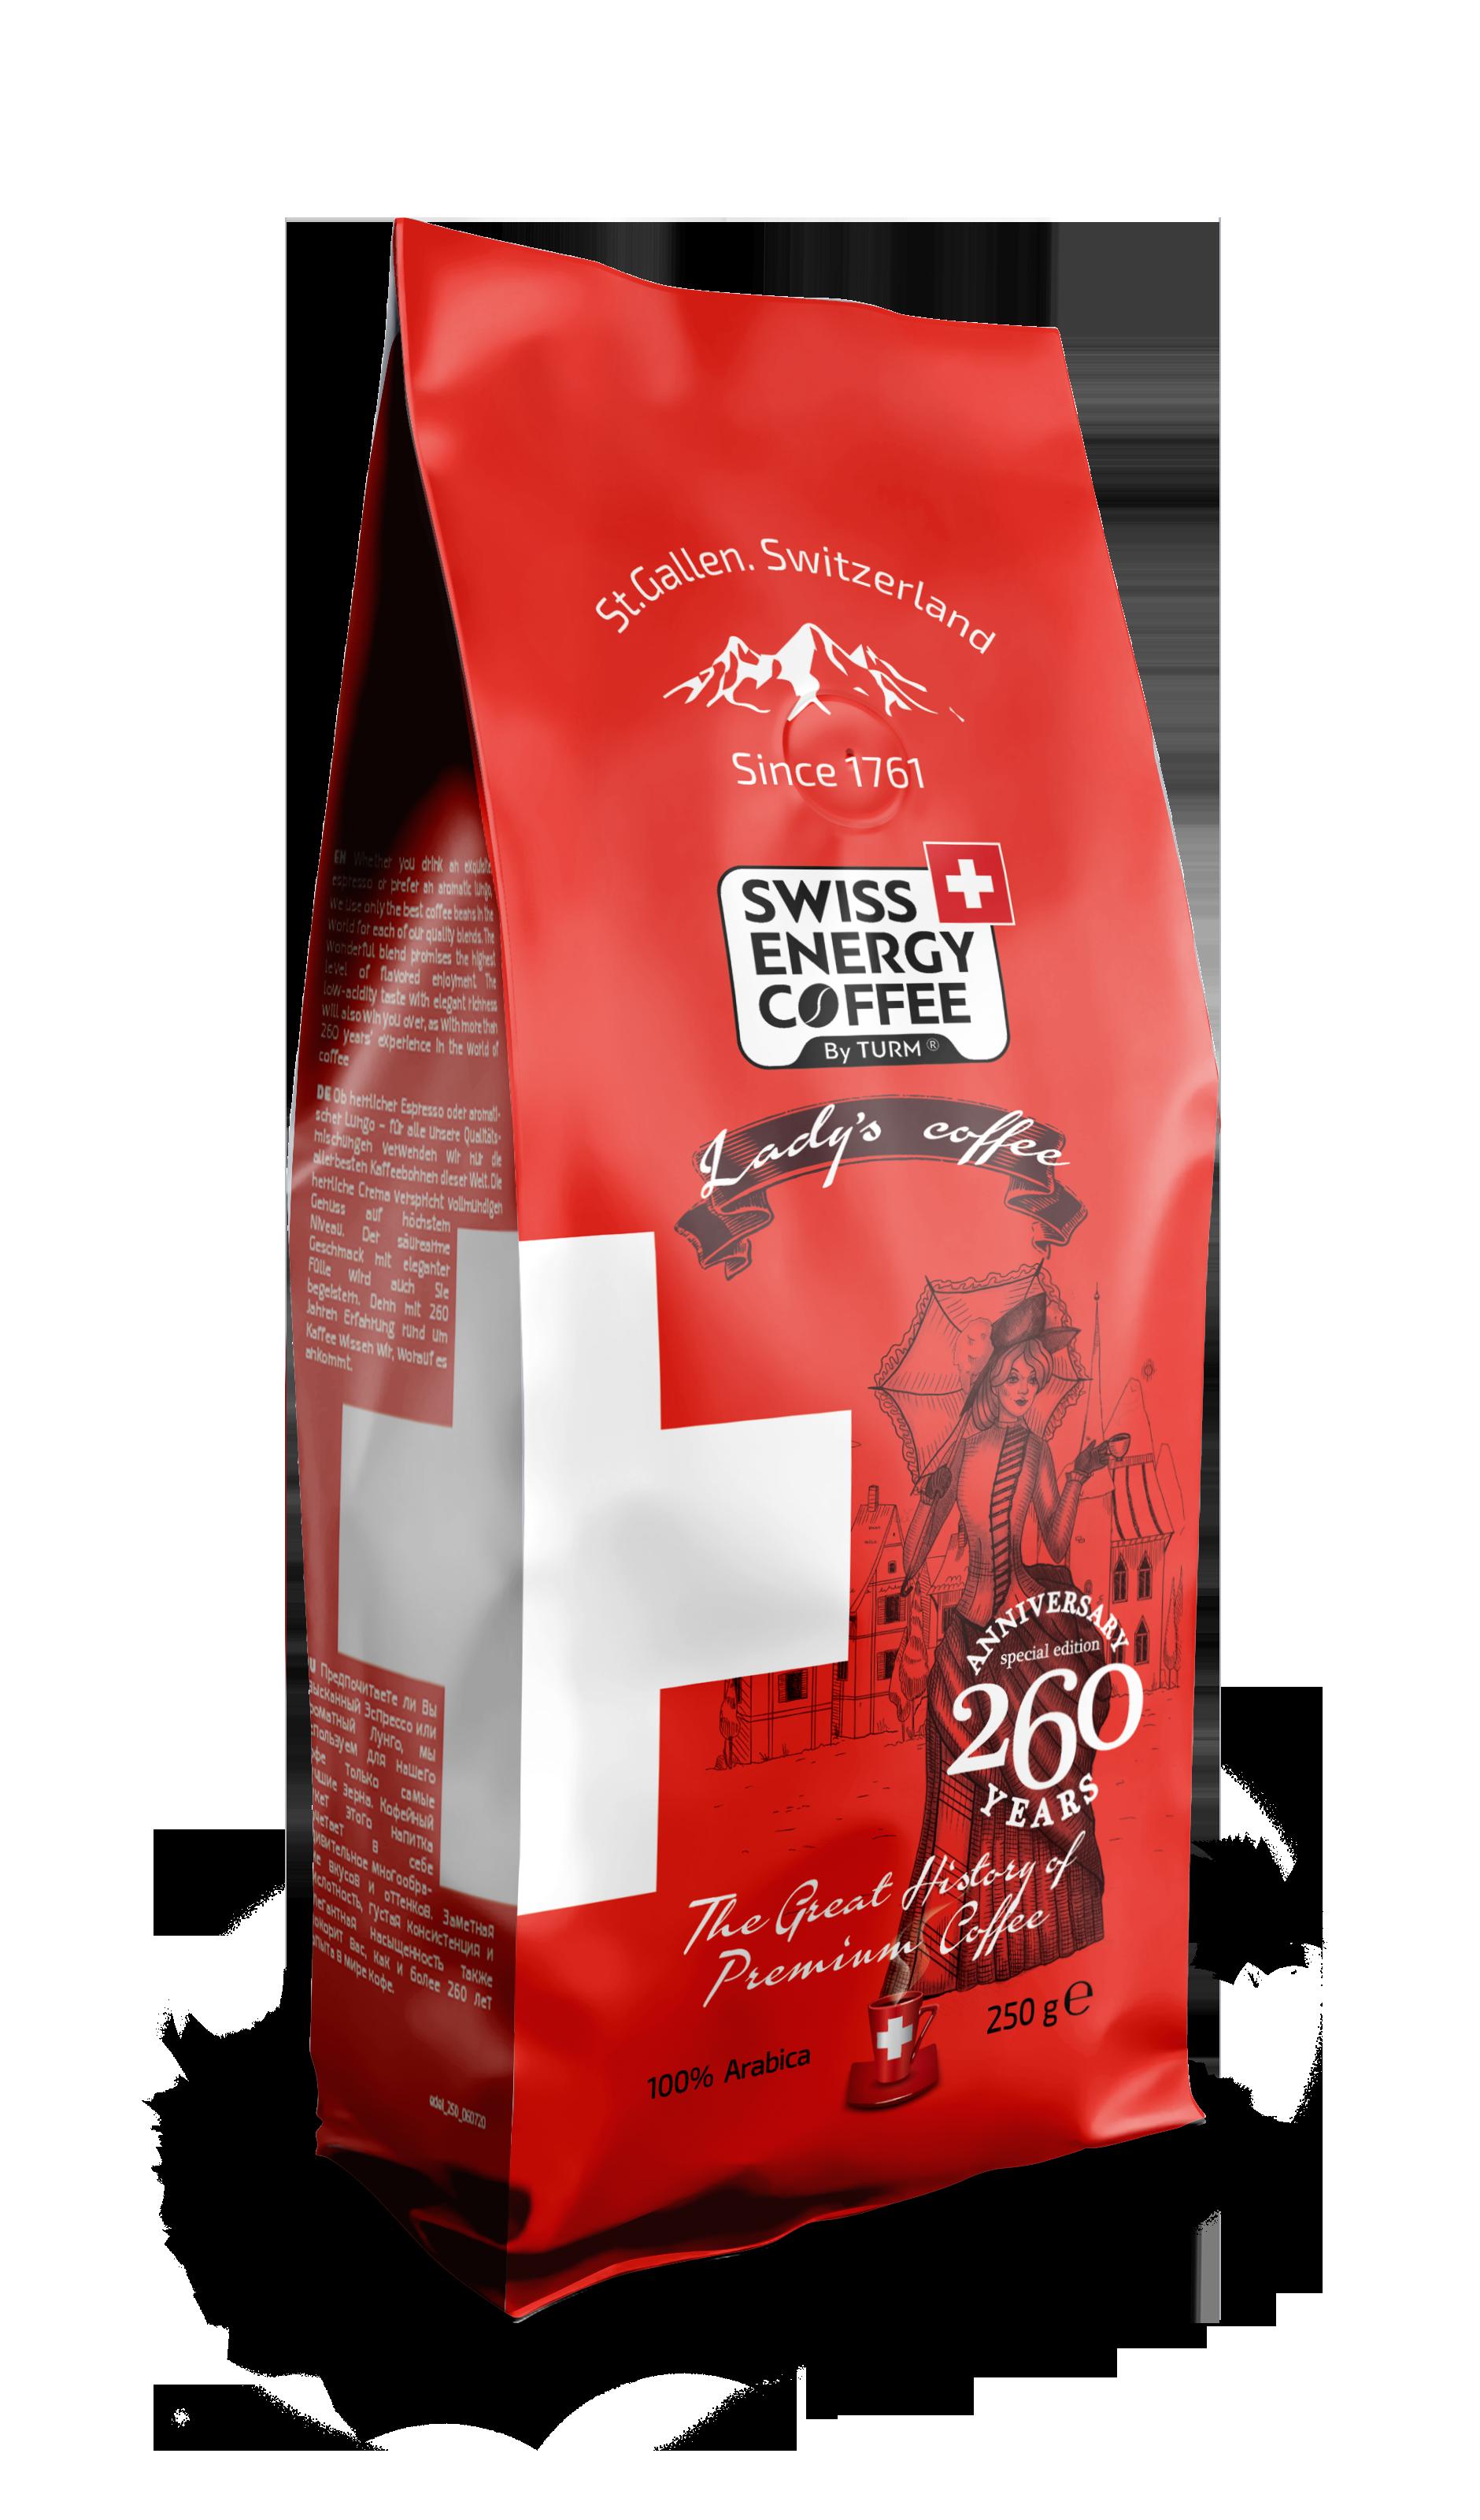 LADY'S COFFEE